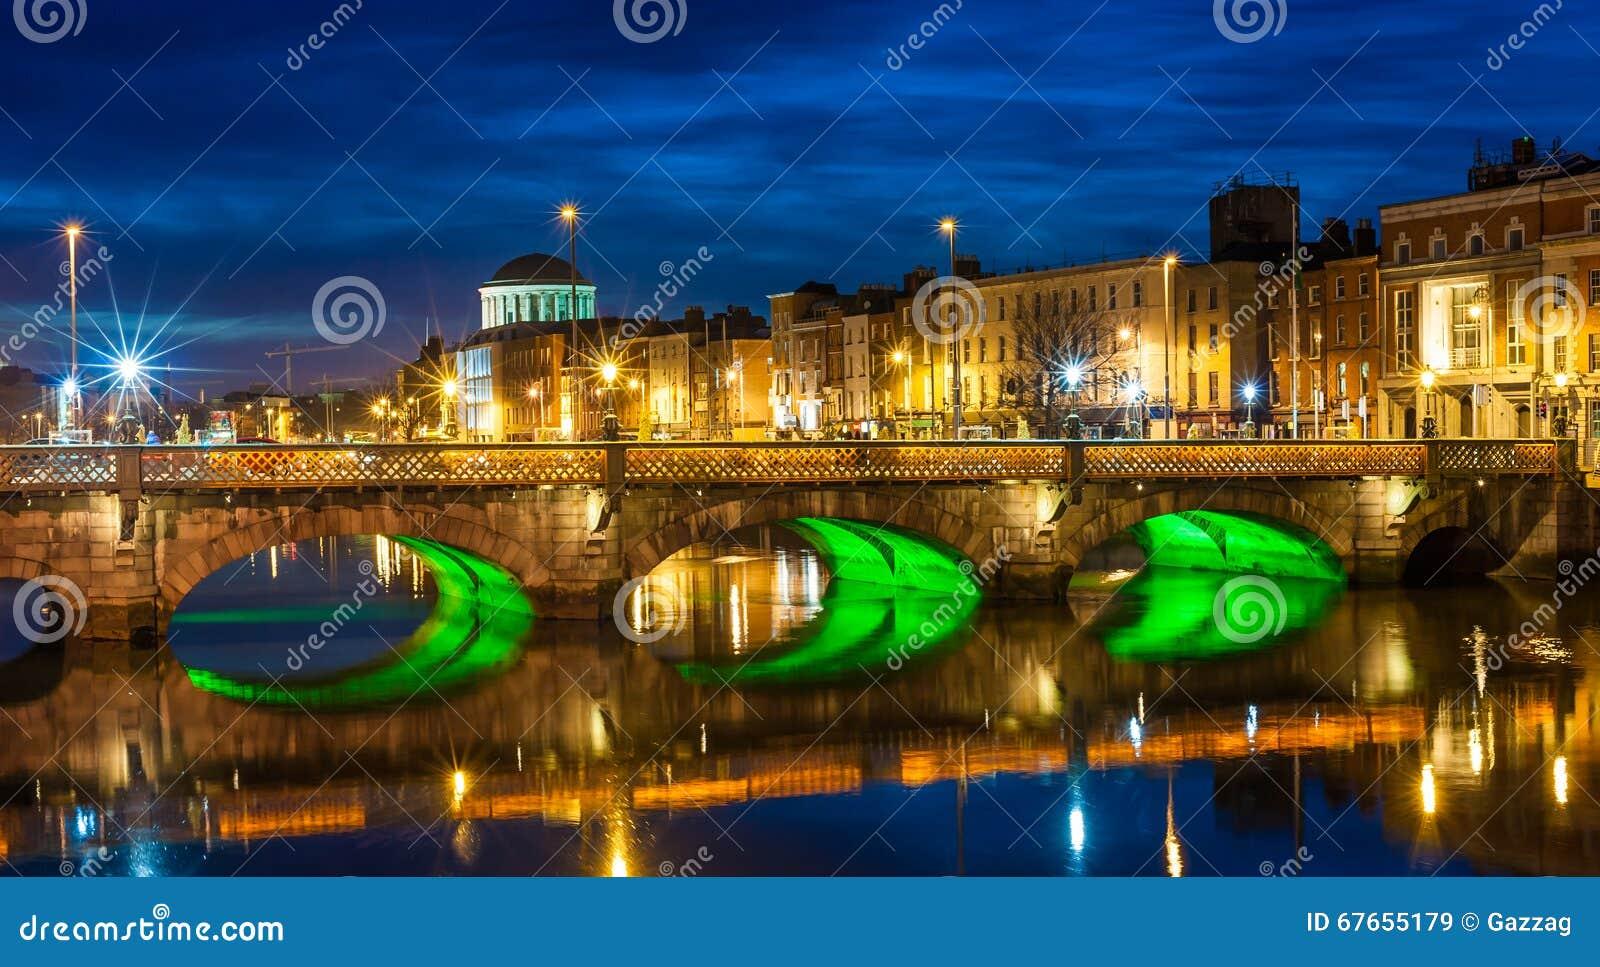 Grattan most, Dublin